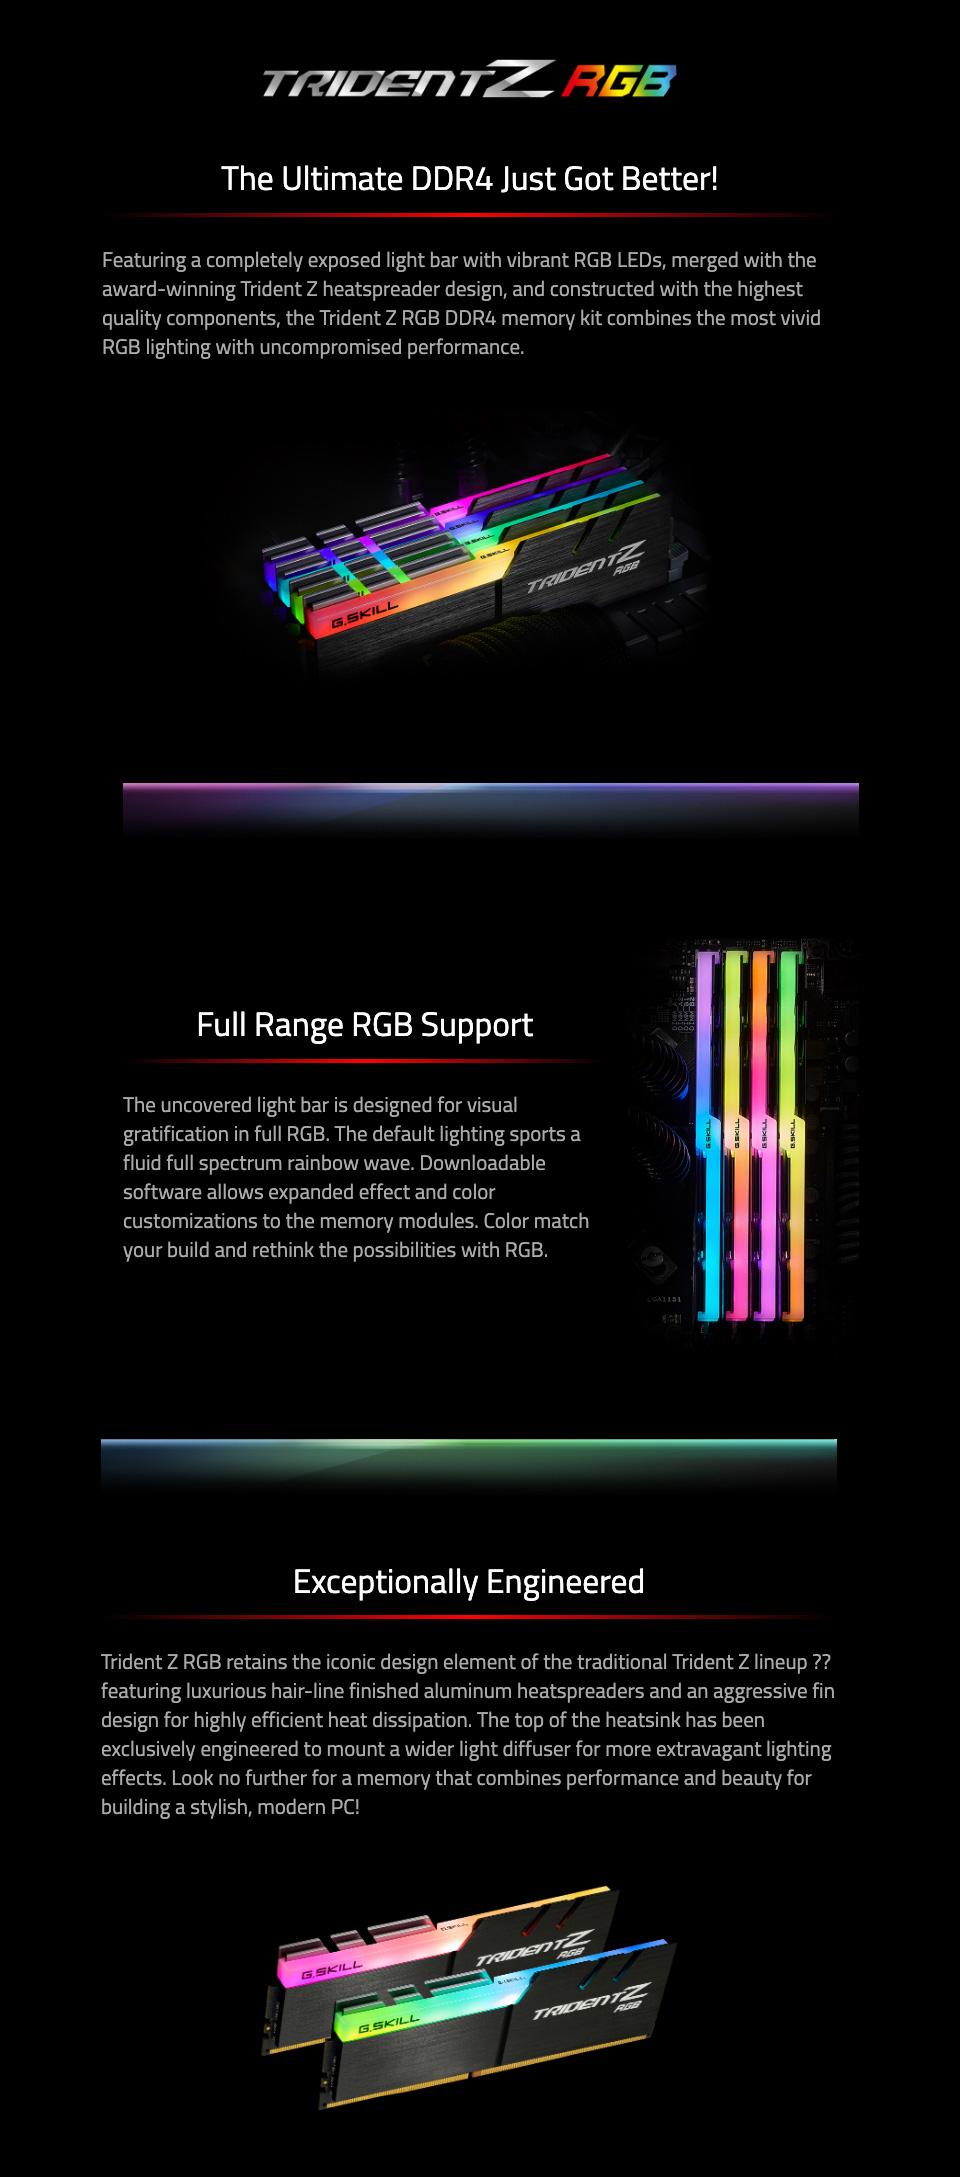 G.Skill Trident Z RGB F4-3600C16D-32GTZR 32GB (2x16GB) DDR4 features